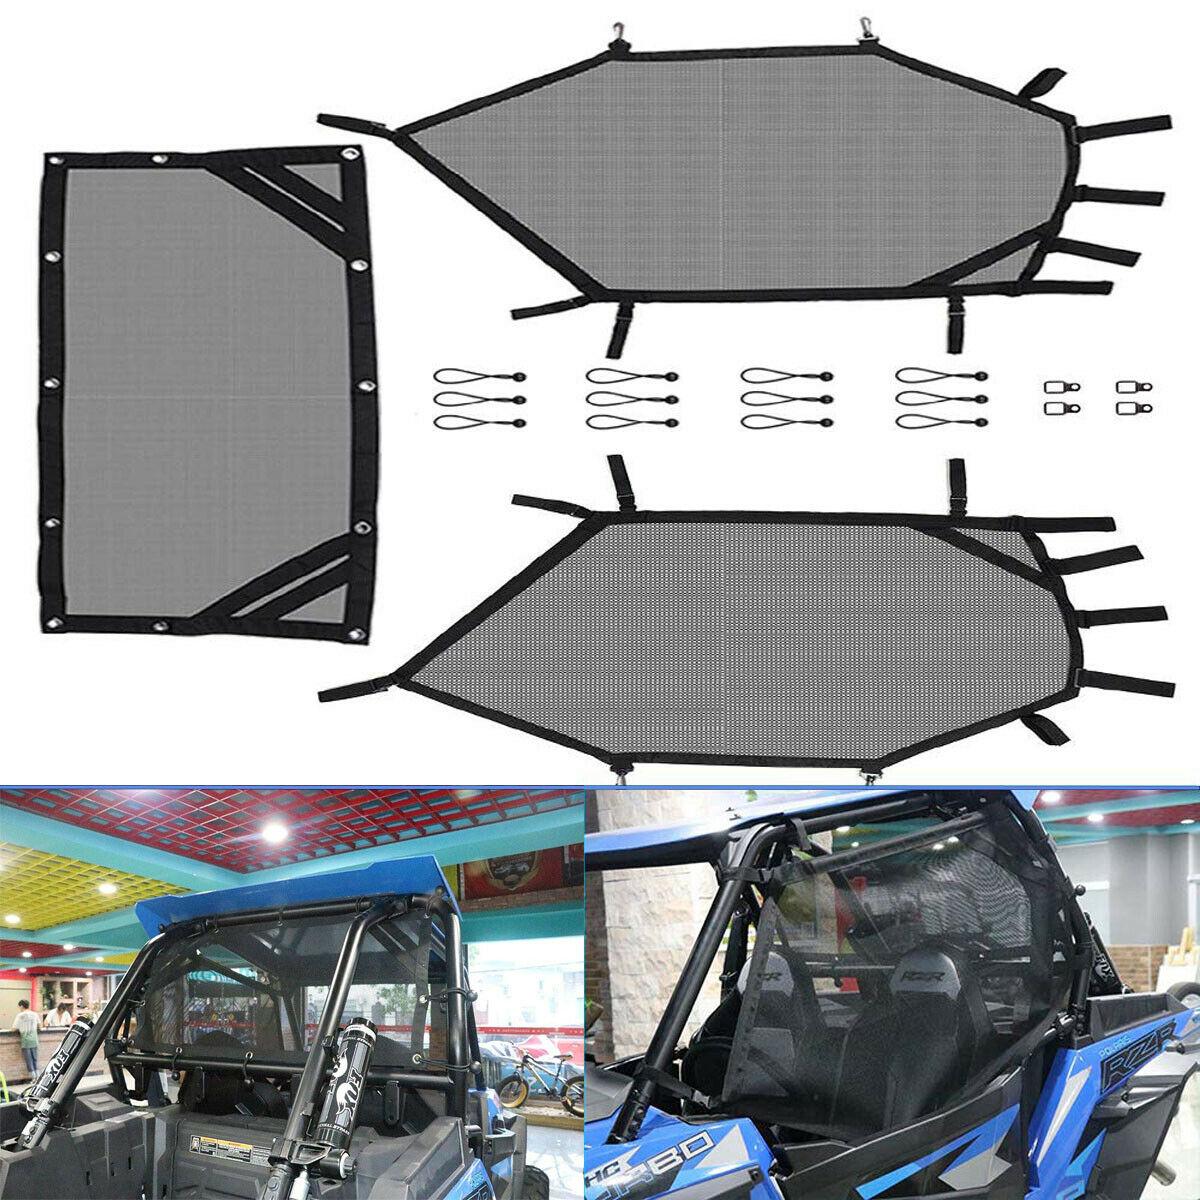 UTV-شبكة نافذة خلفية ويمينية ، مجموعة درع لبولاريس RZR 1000 900 RZR XP لهوندا تالون كاواساكي ميول لياماها Rhino